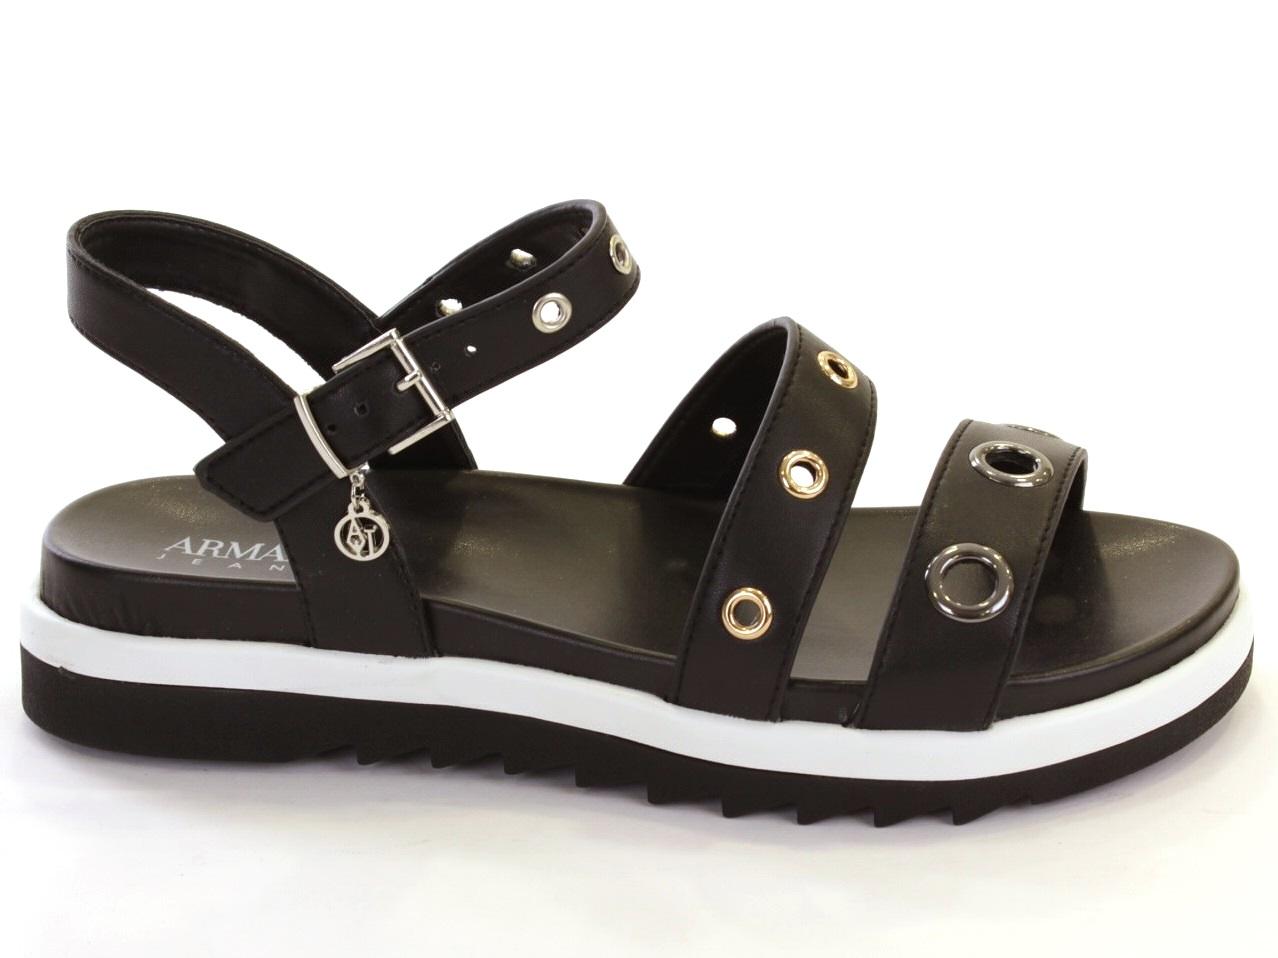 Sandales Plates Armani, Emporio - 529 925132